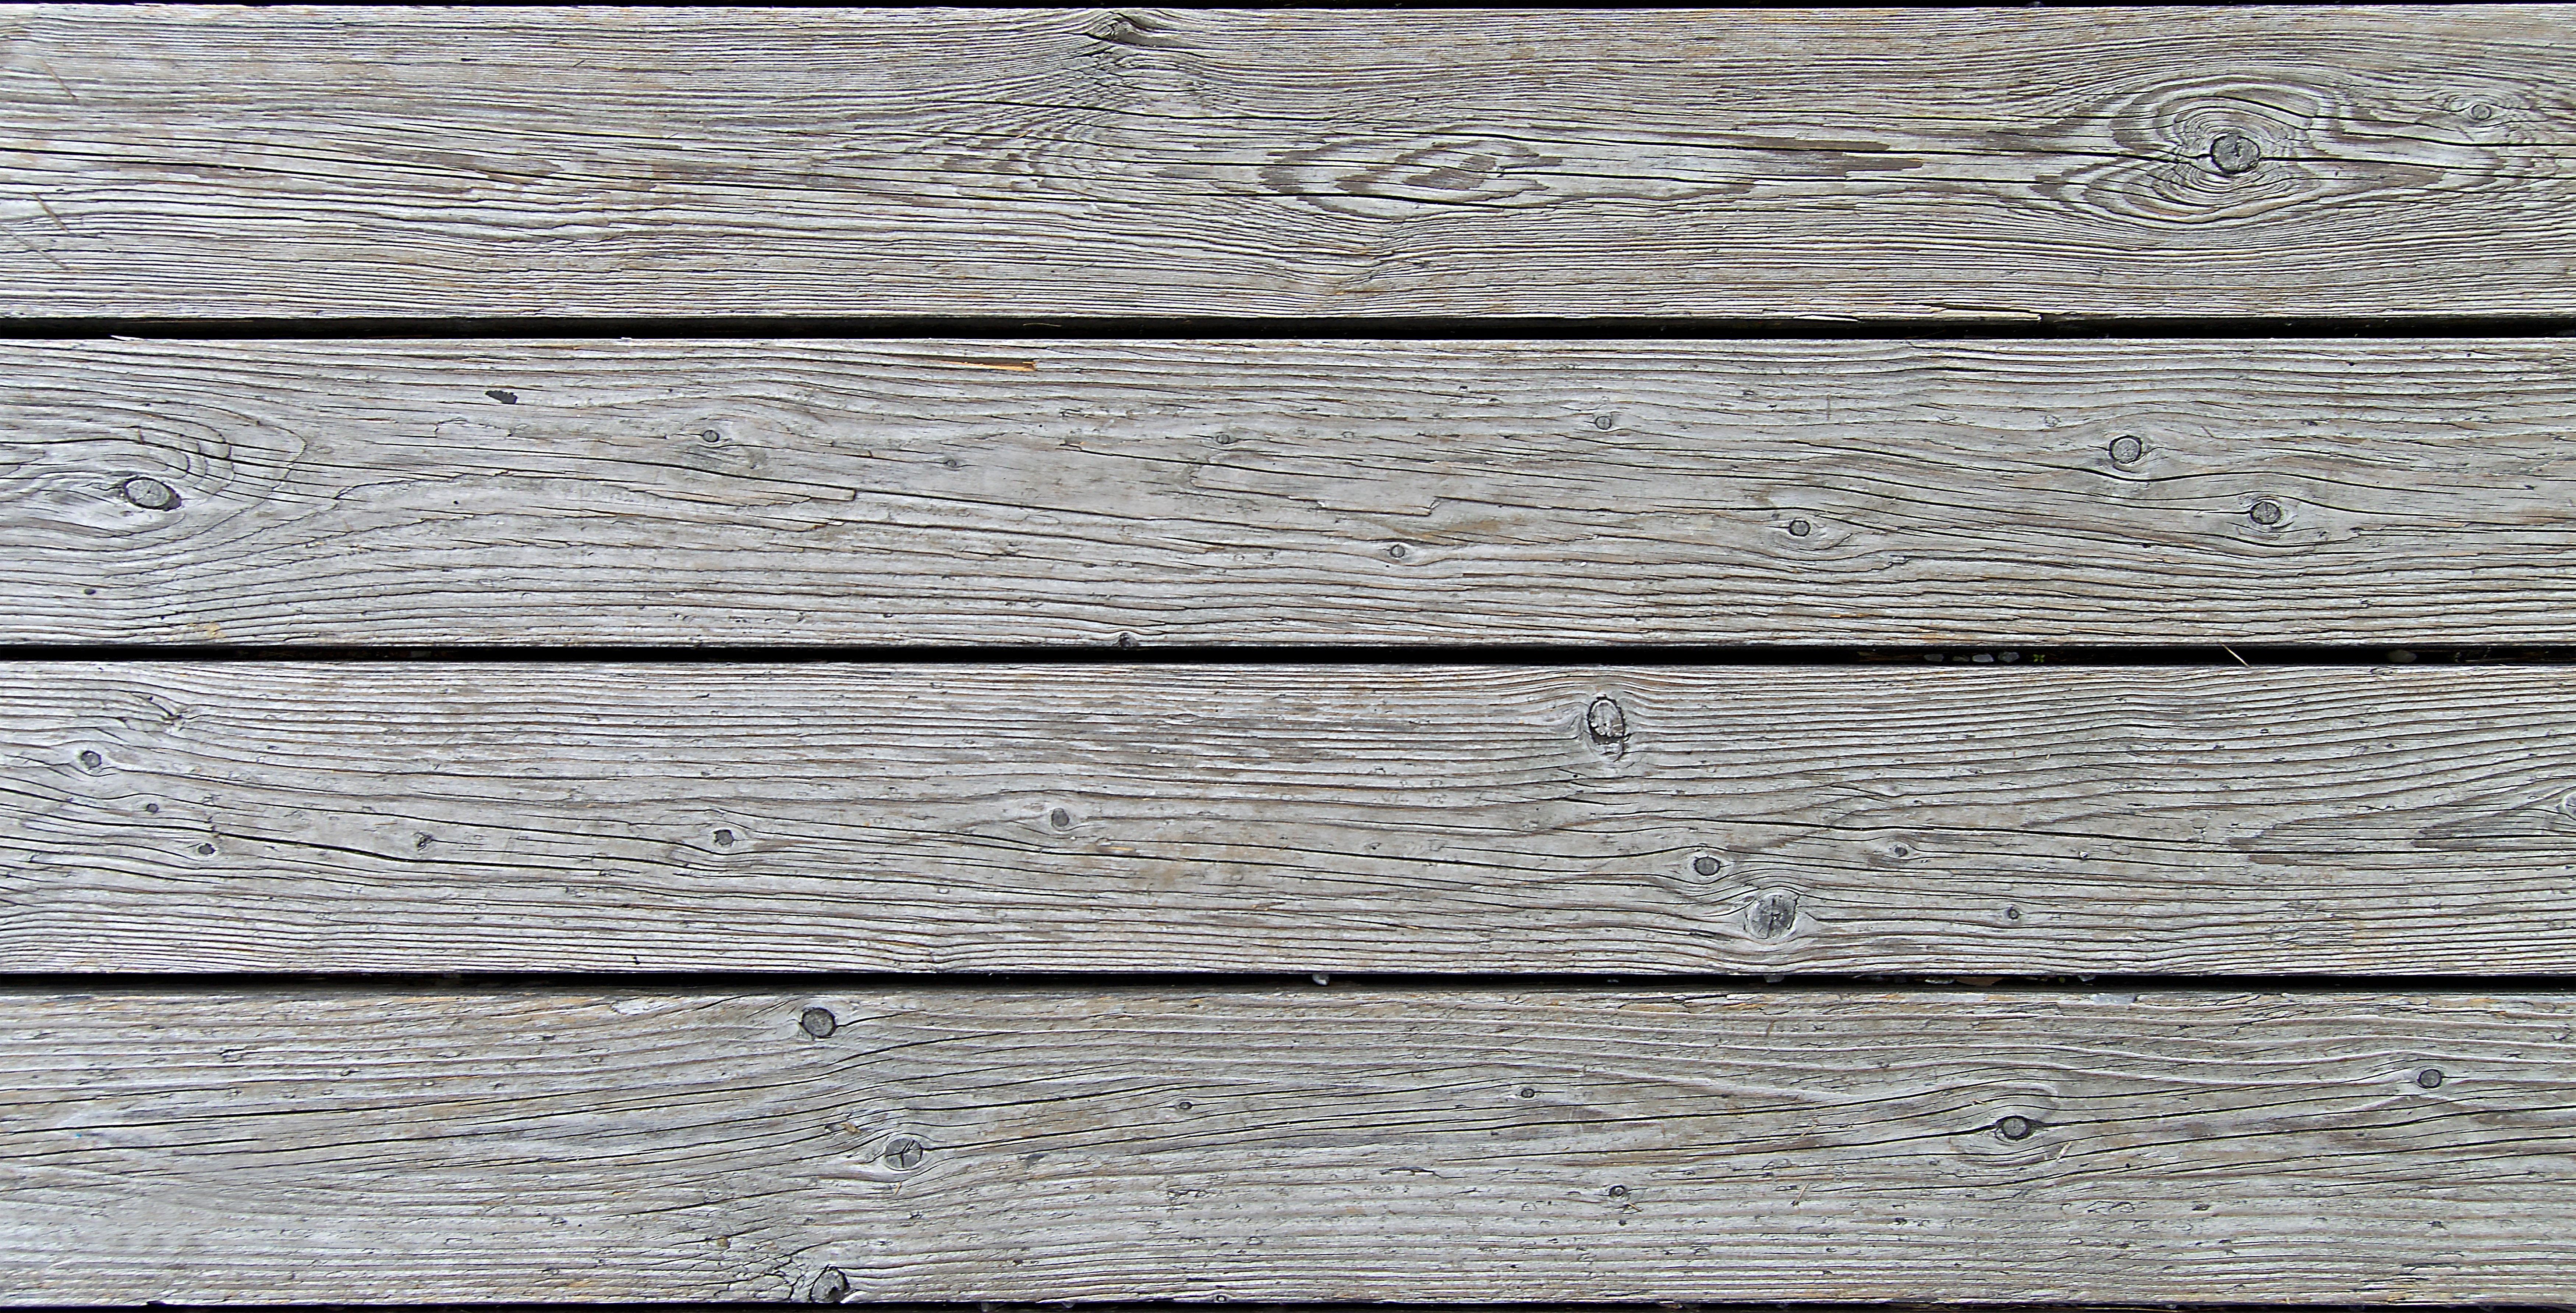 Kostenlose Foto Struktur Holz Textur Planke Stock